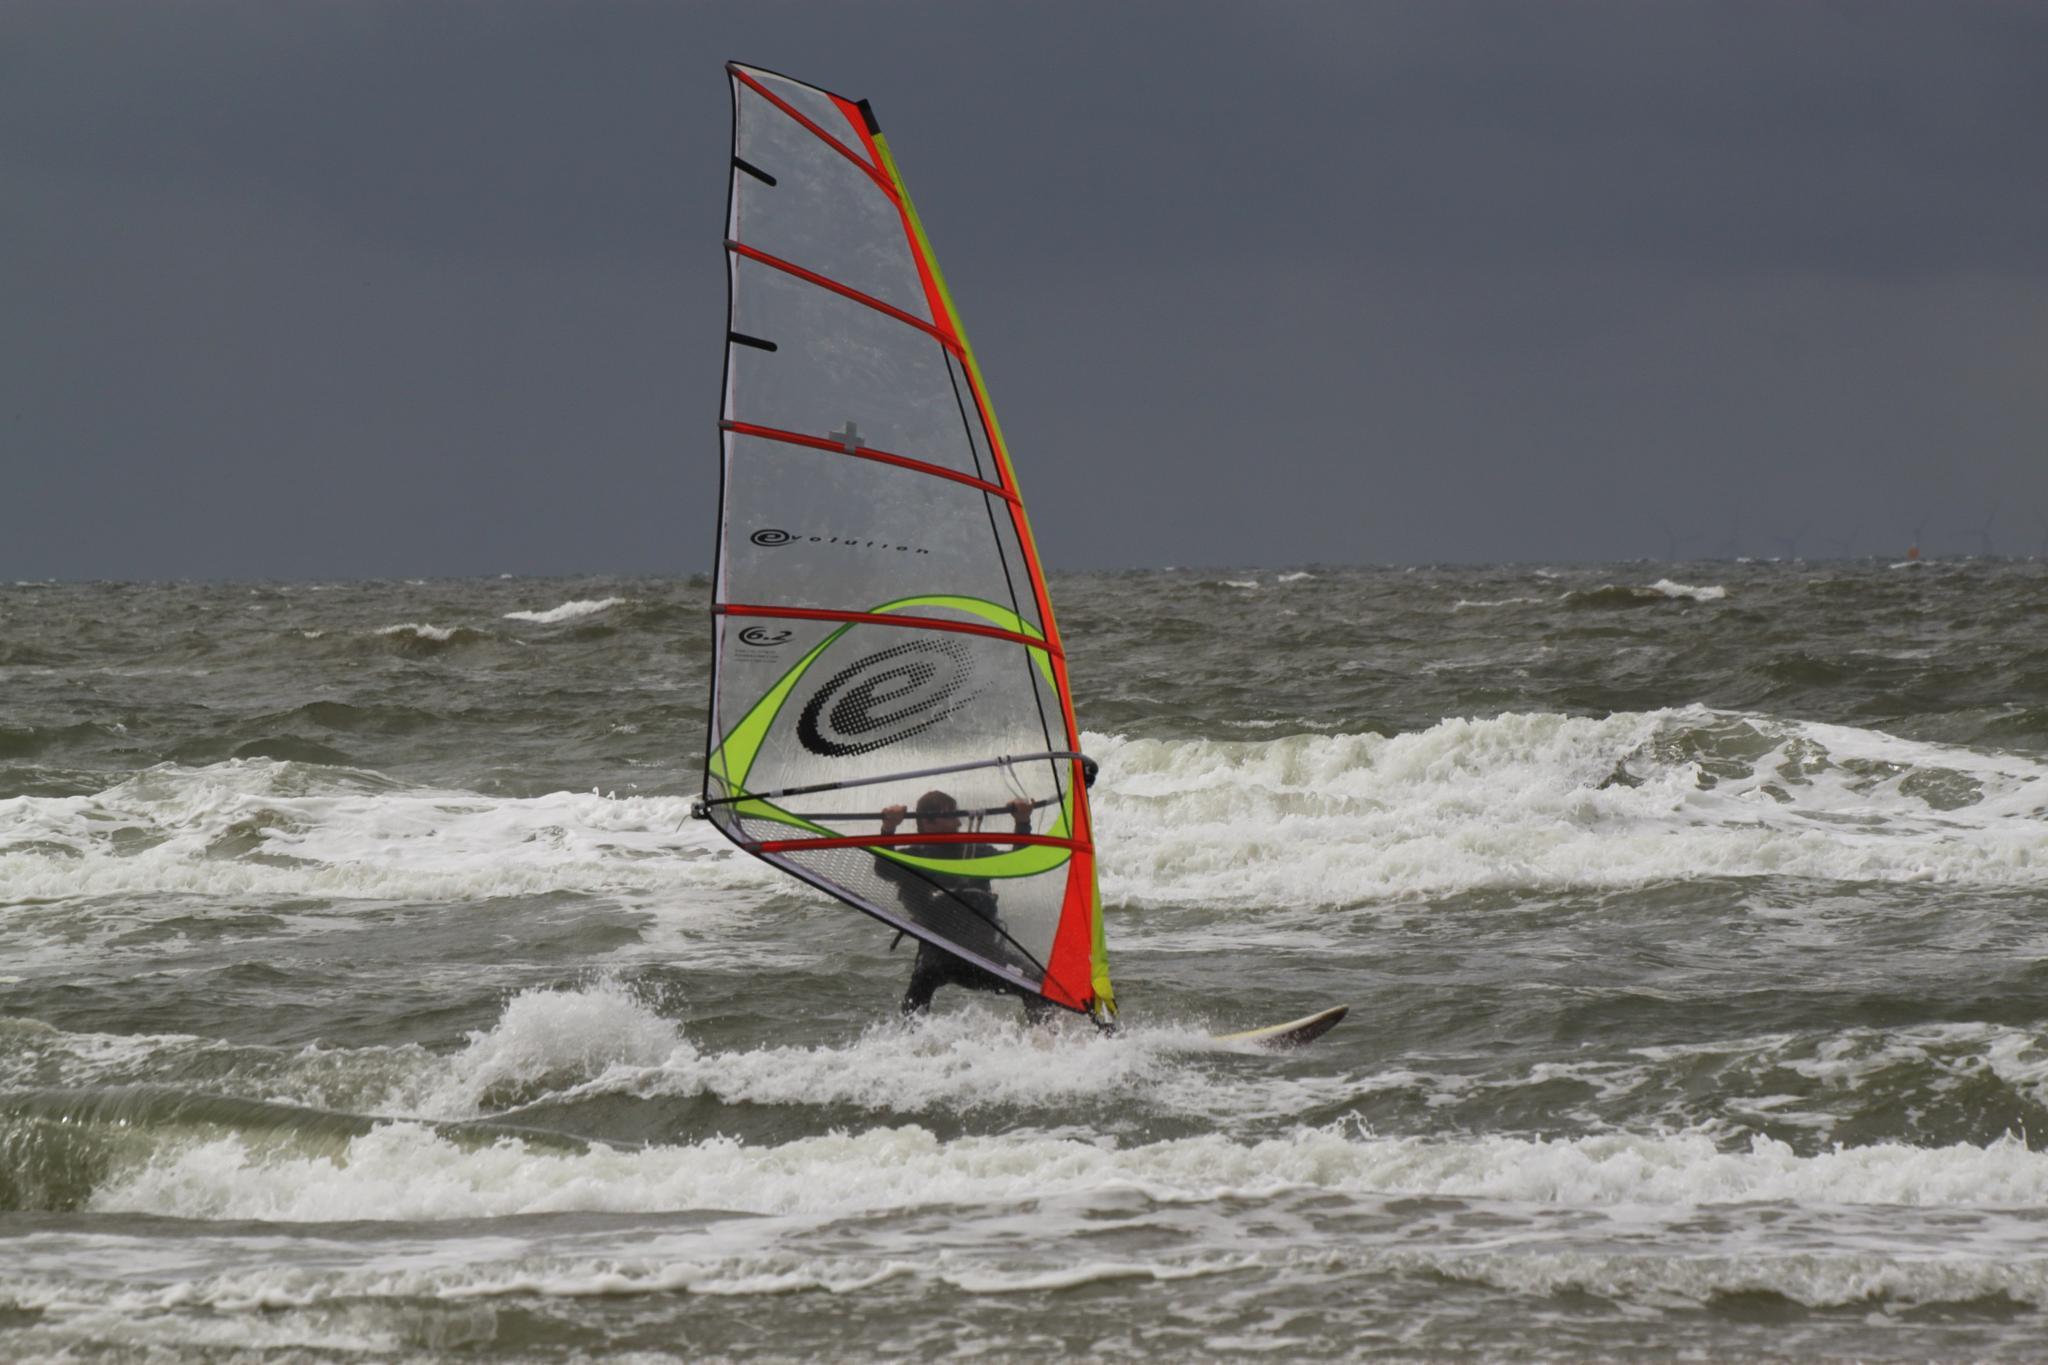 Surfing in the North Sea near Wijk aan Zee by Sijb Huijser